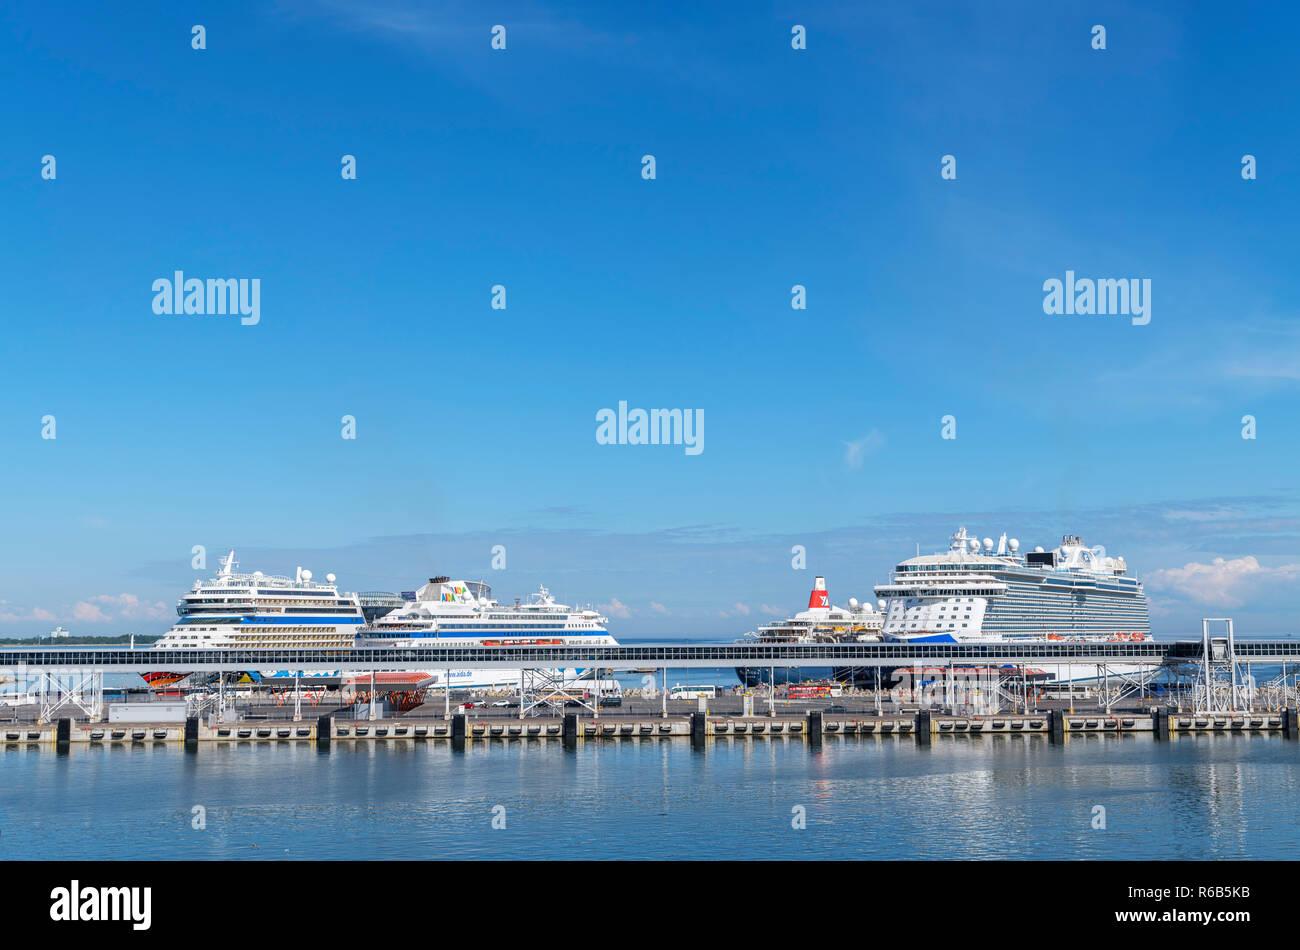 Cruise ships in the port of Tallinn, Estonia - Stock Image